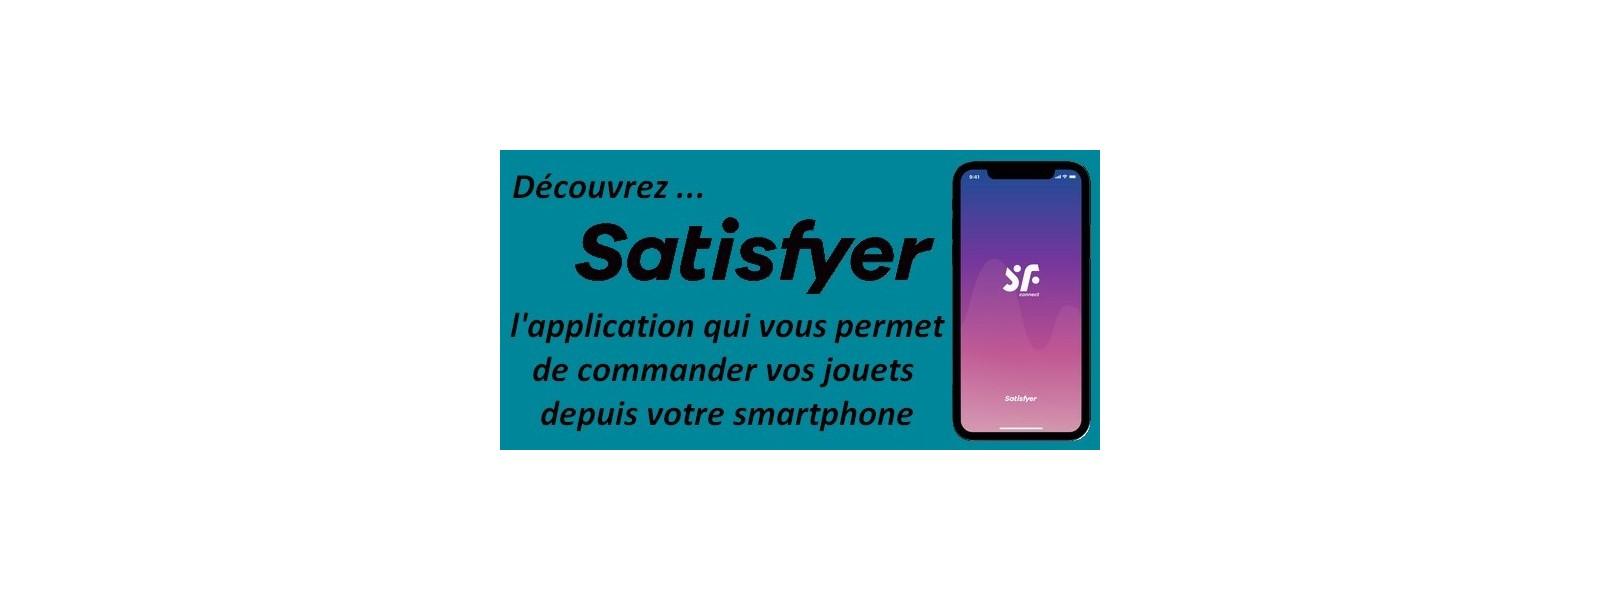 Satisfyer application smartphone